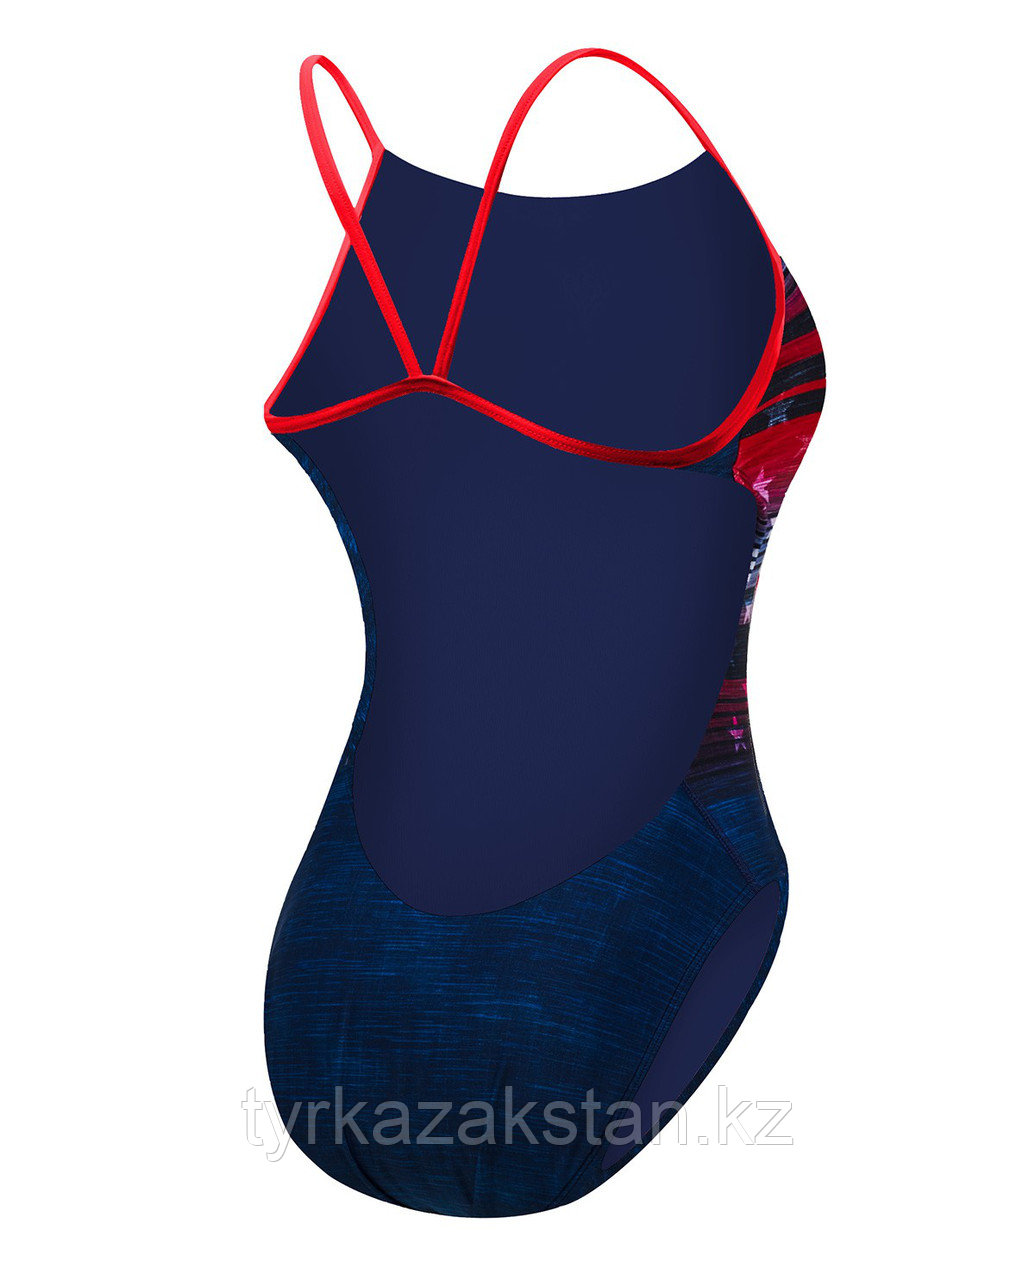 Купальник TYR Women's Liberty Cutoutfit Swimsuit 636 - фото 4